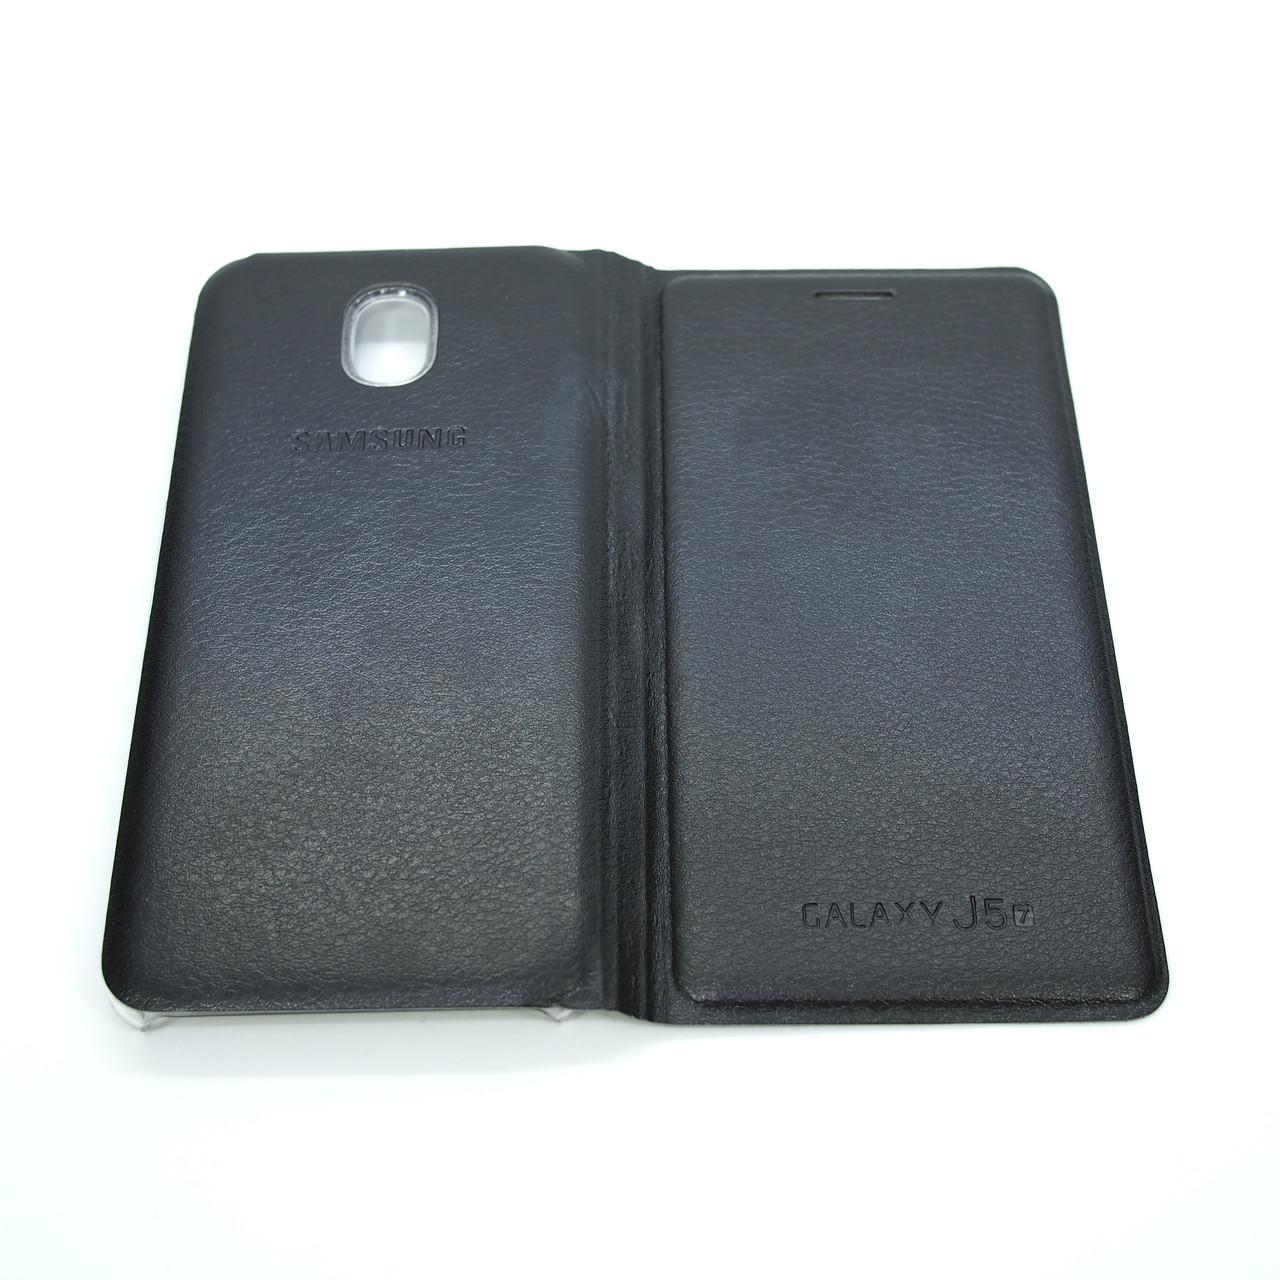 Чехол Book-case Samsung J530 black Galaxy J5 (J530) 2017 Для телефона